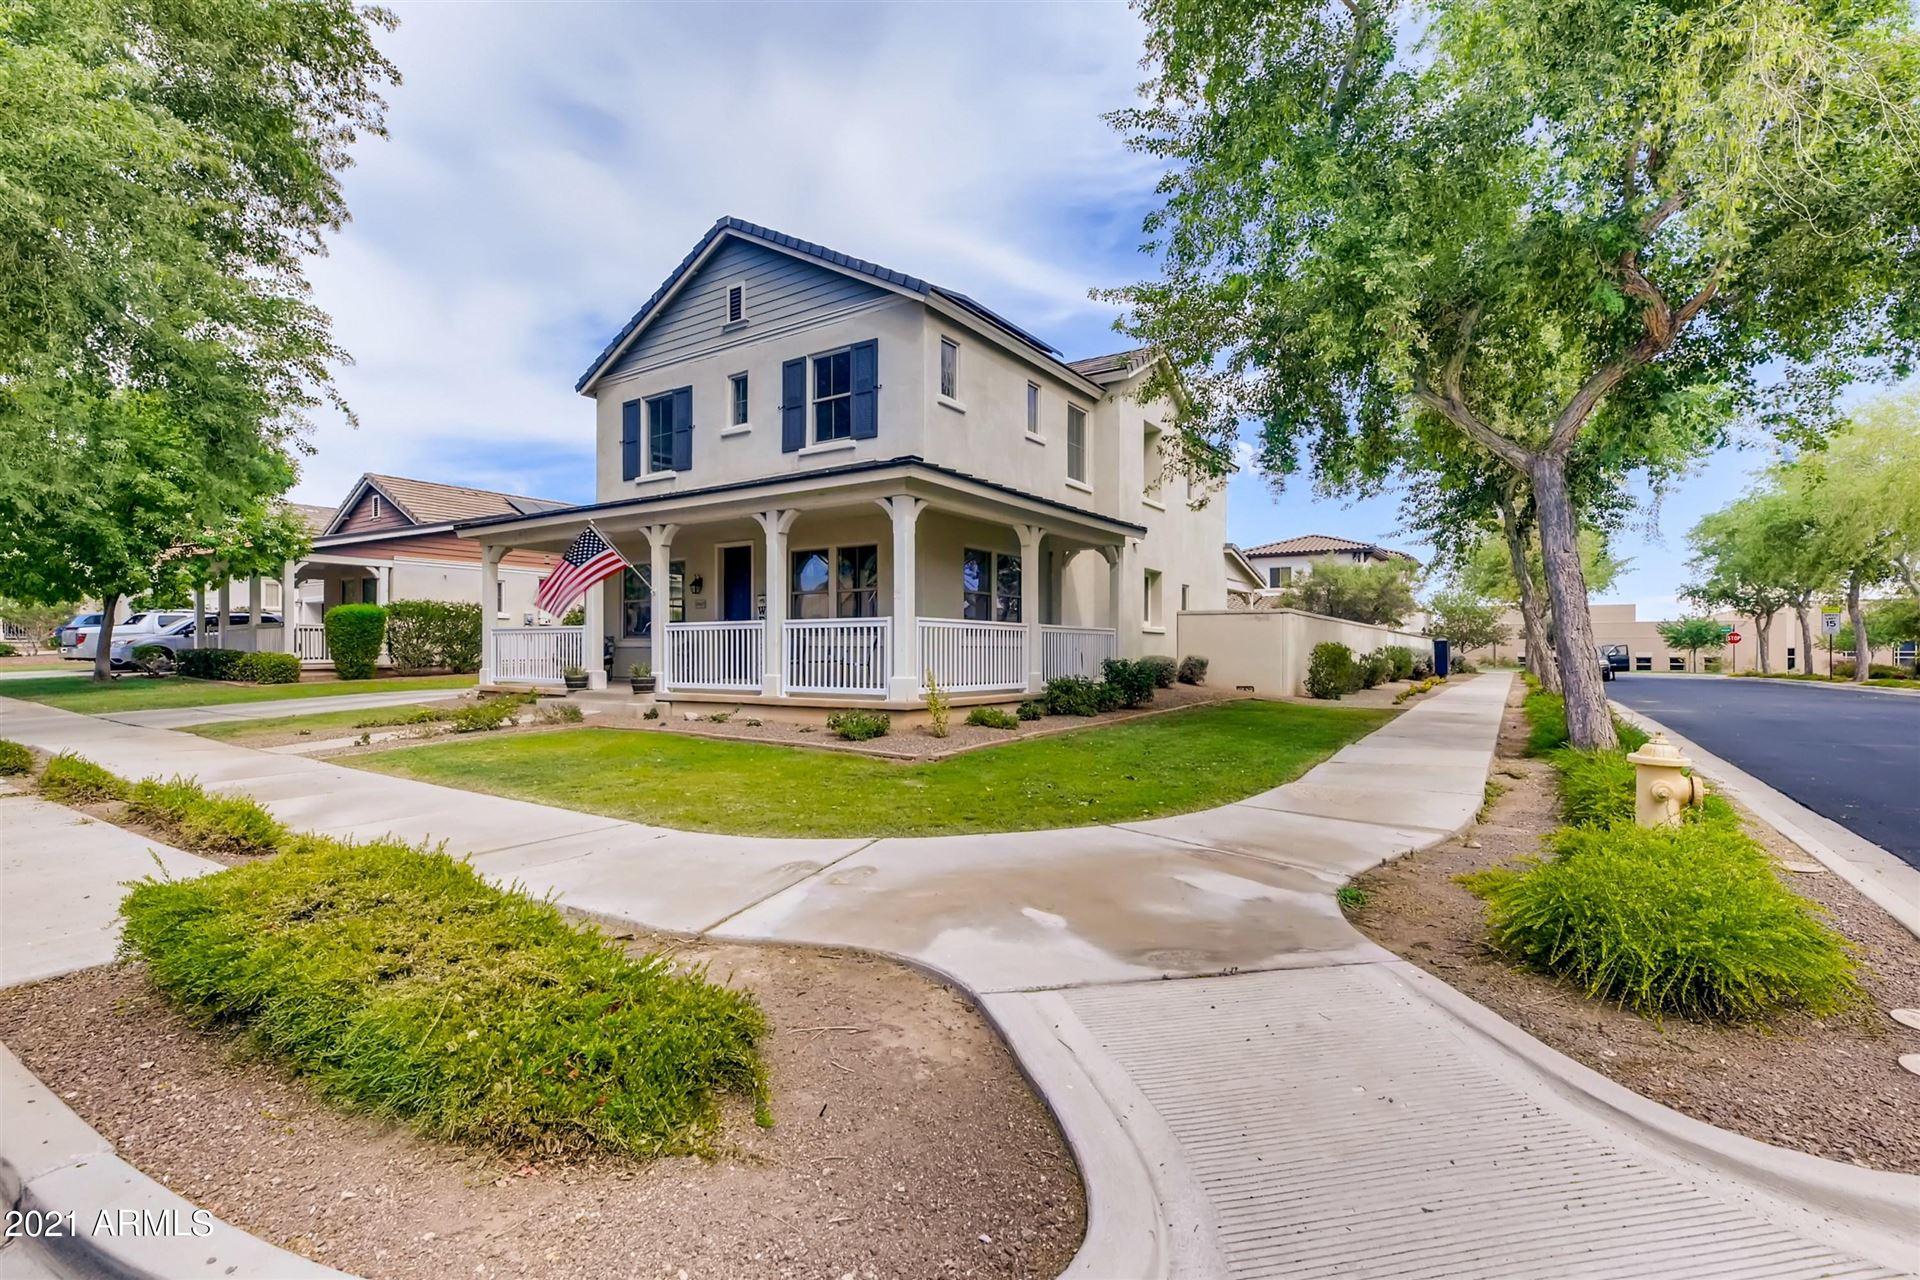 Photo of 20927 W RIDGE Road, Buckeye, AZ 85396 (MLS # 6249832)